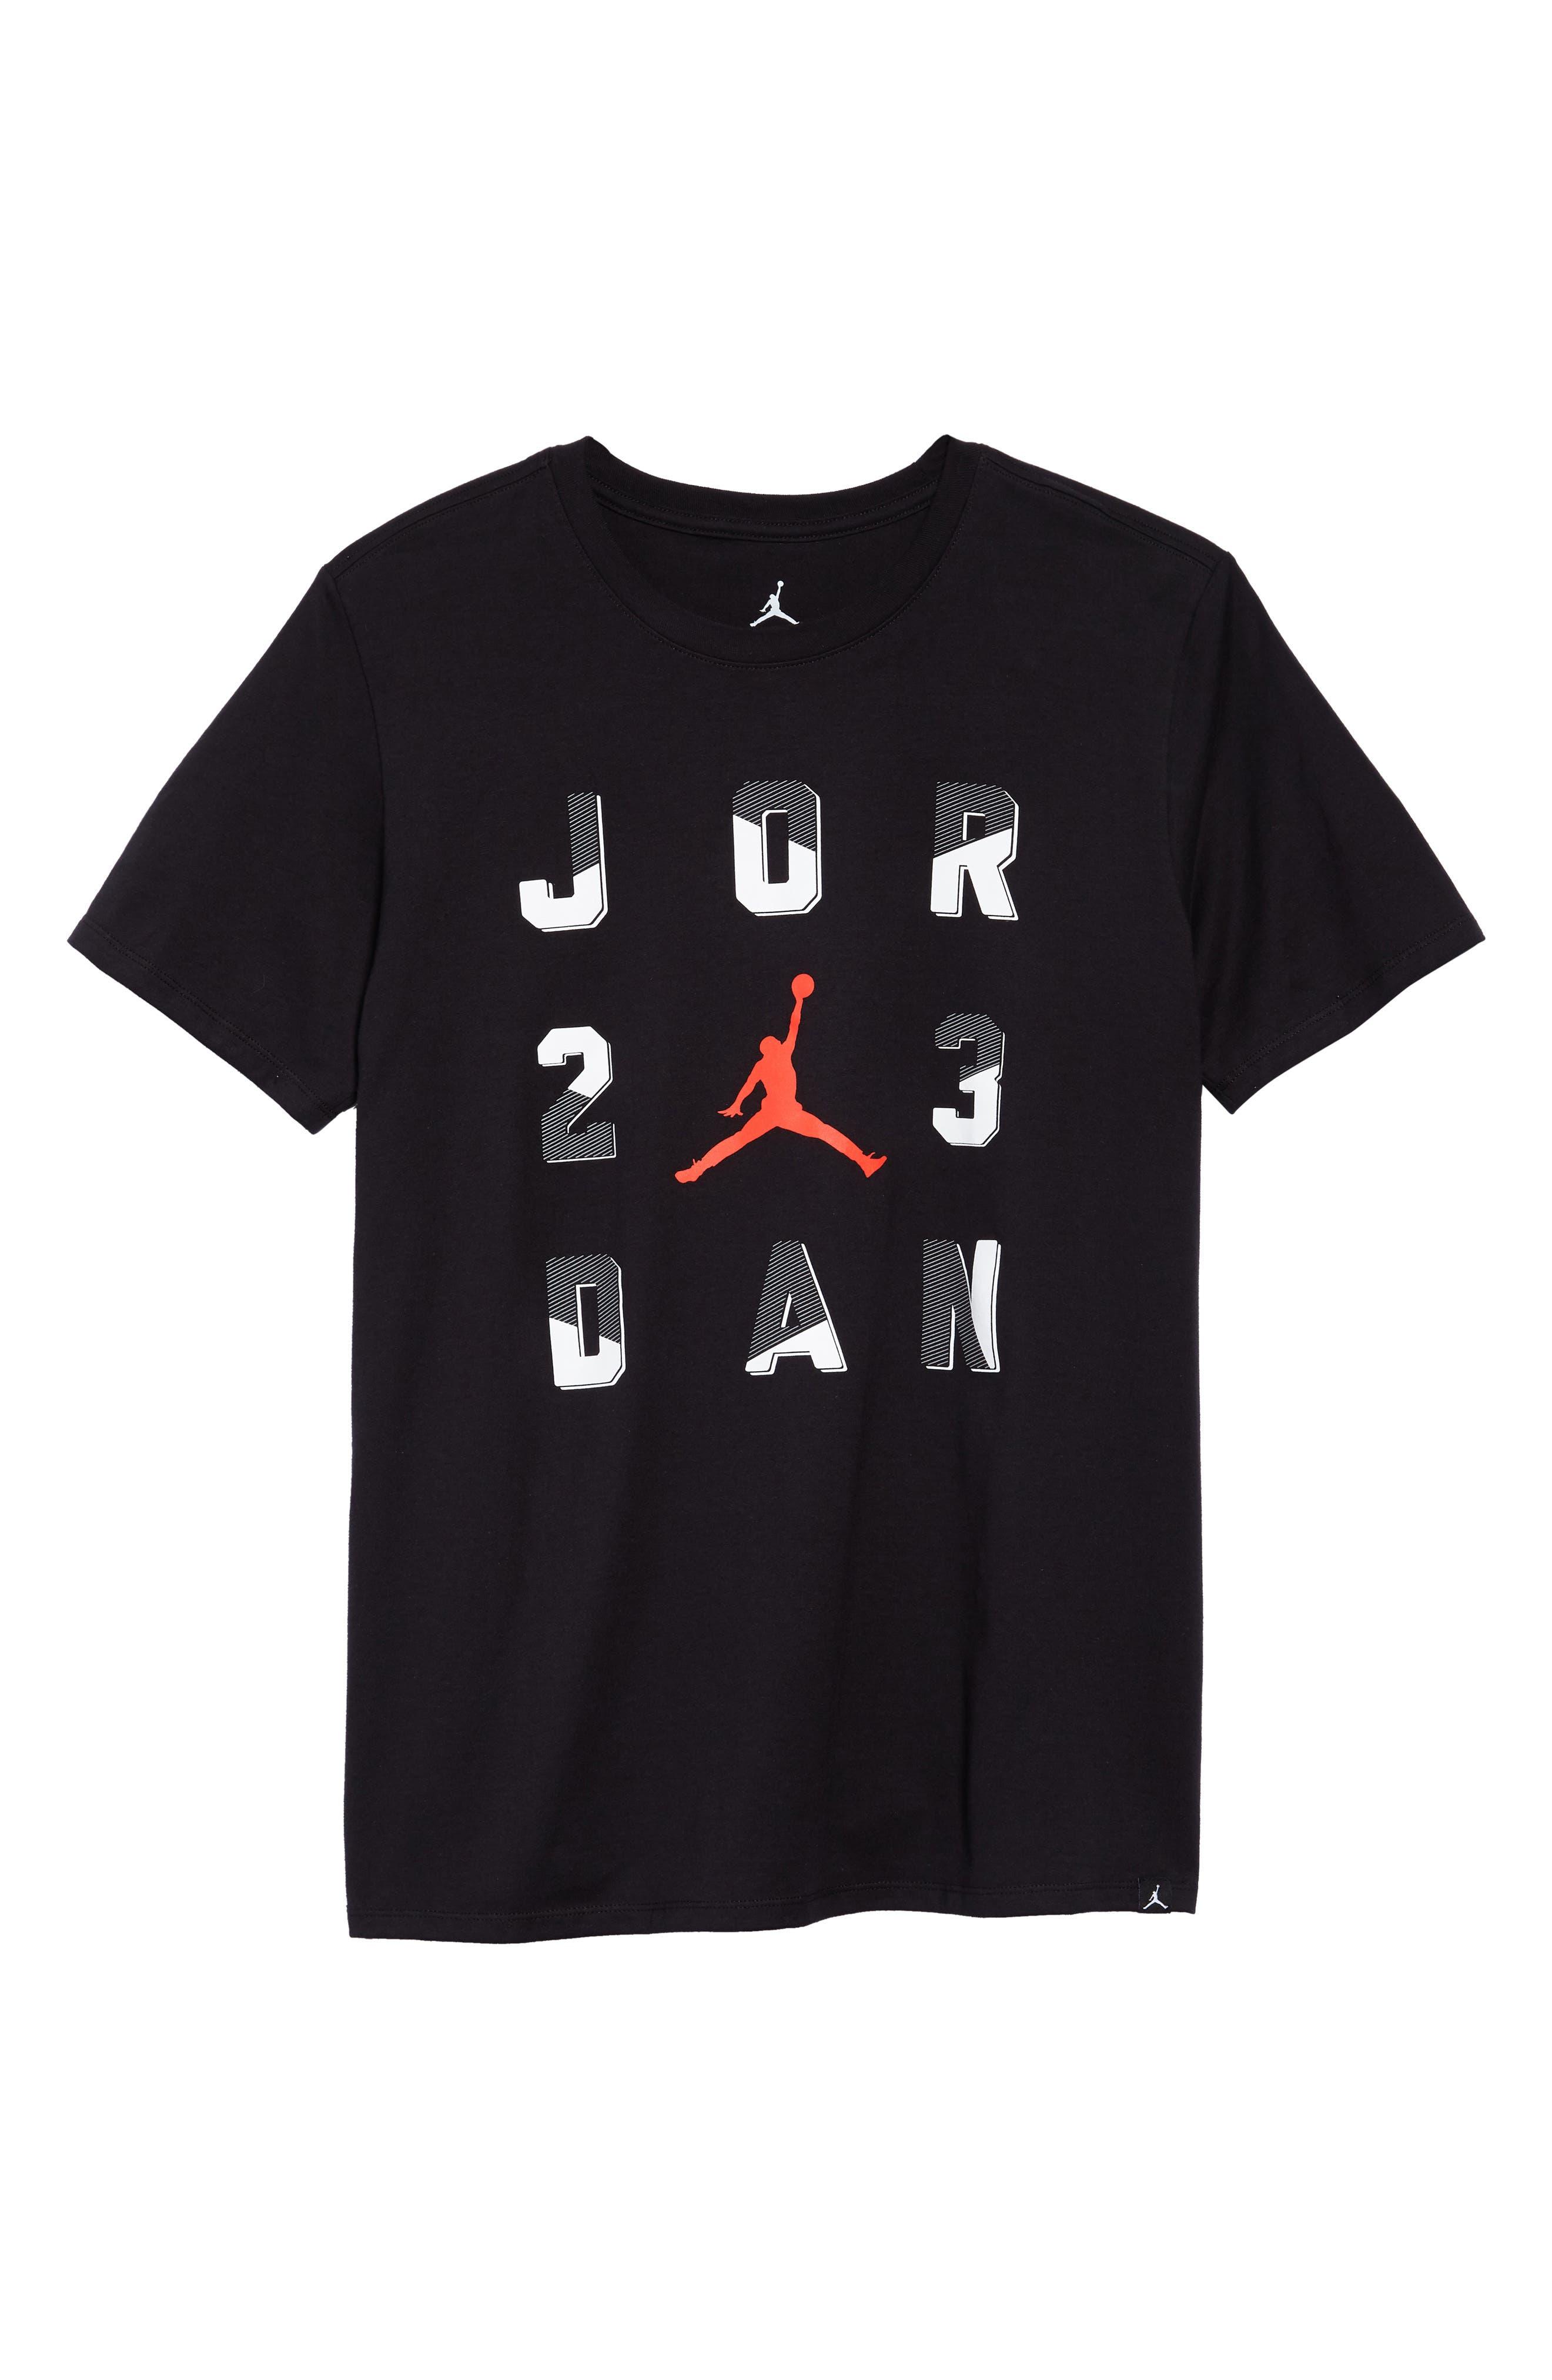 Sportswear 23 T-Shirt,                             Alternate thumbnail 6, color,                             BLACK/ INFRARED 23